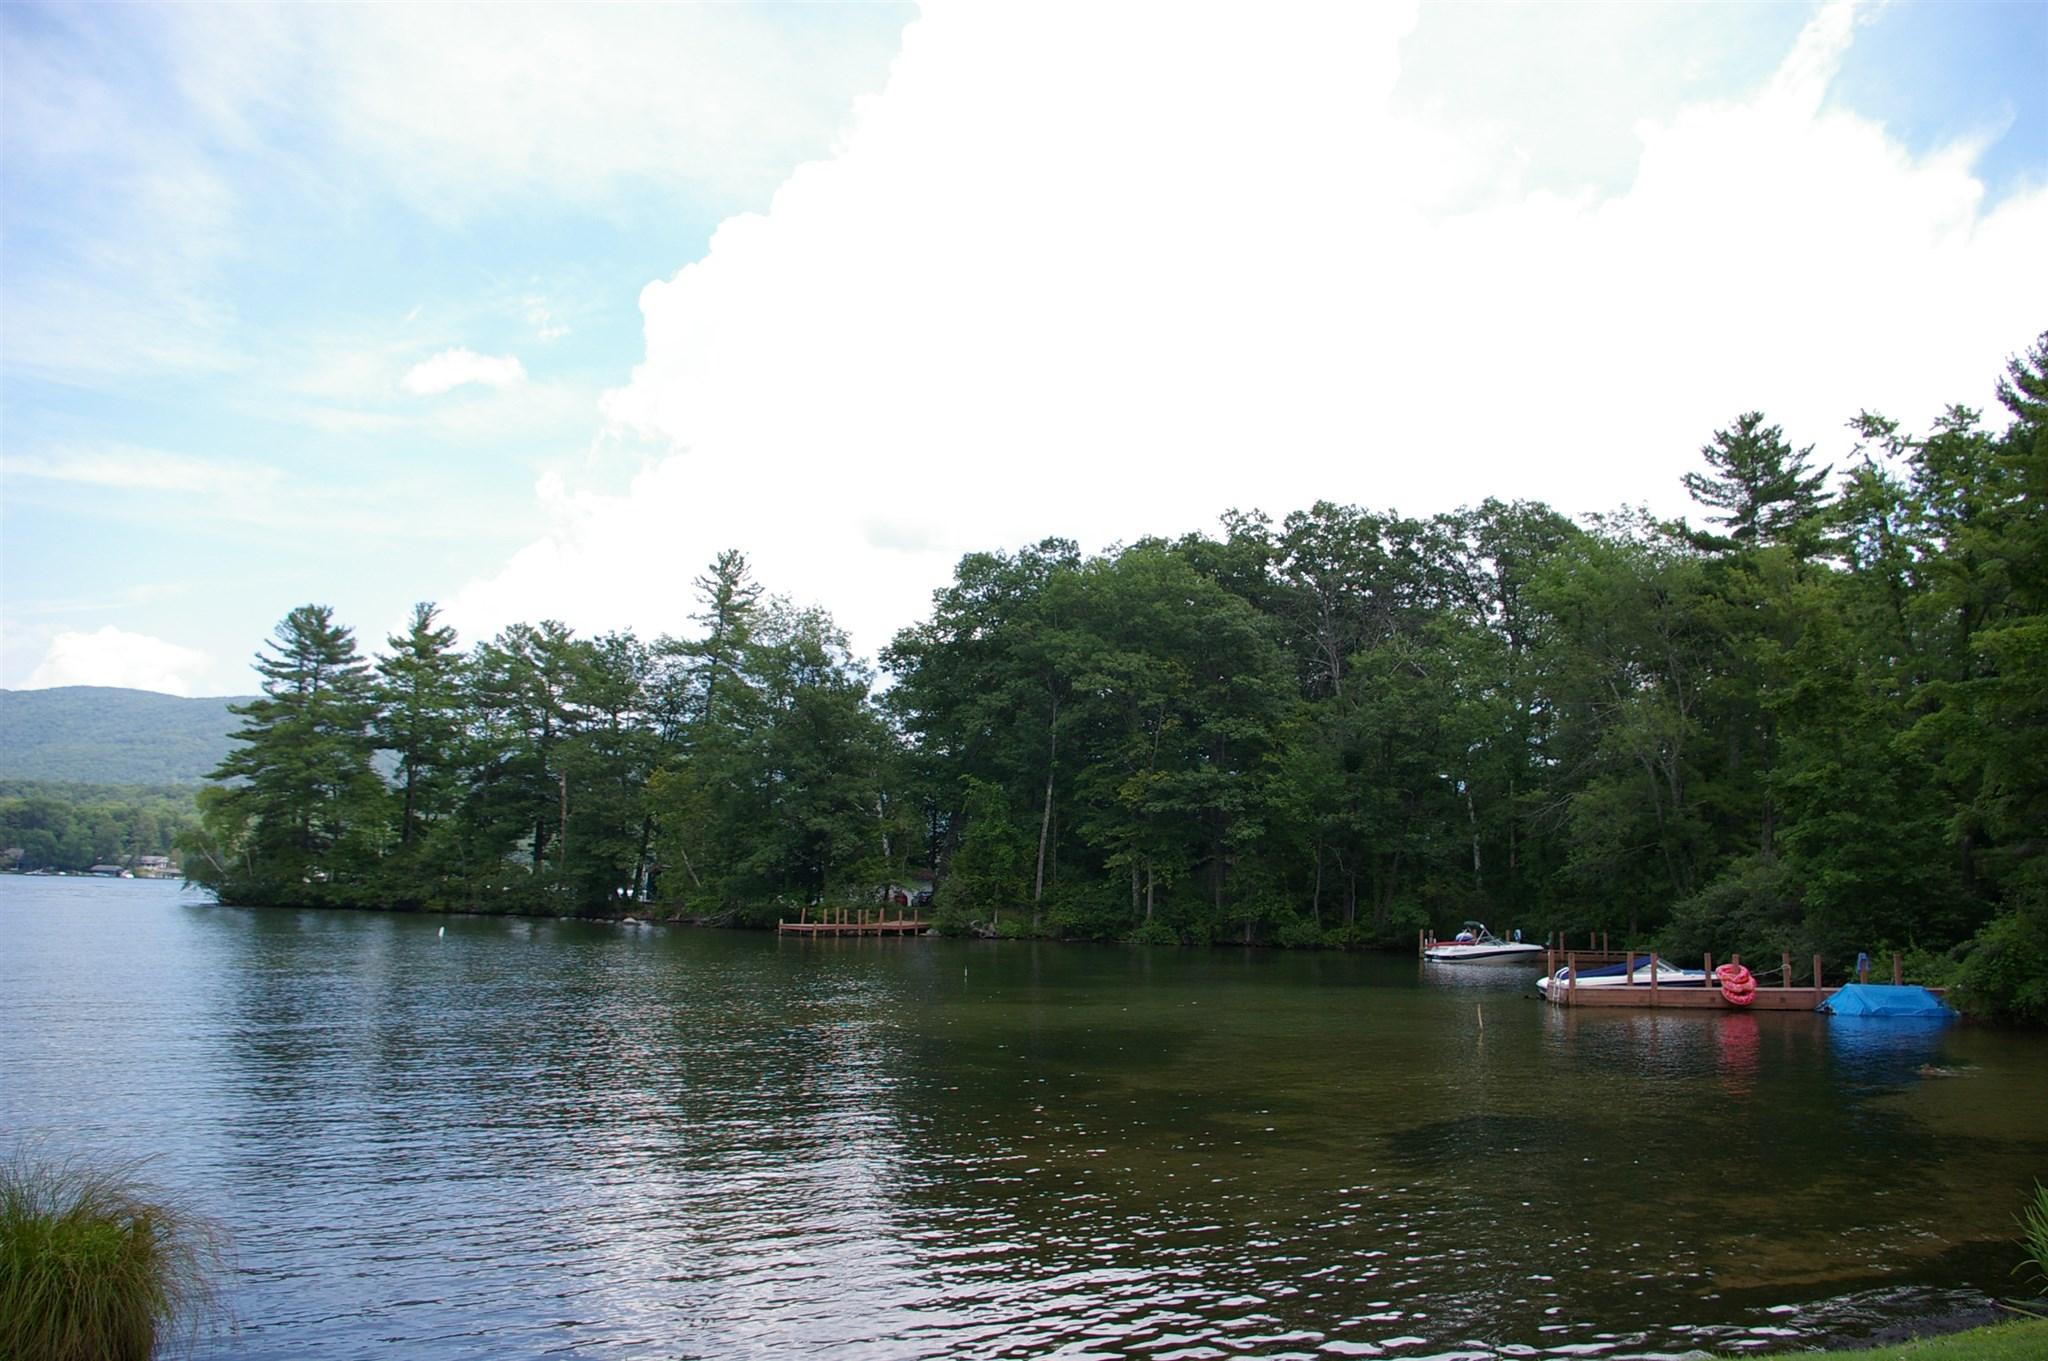 Lake George image 38